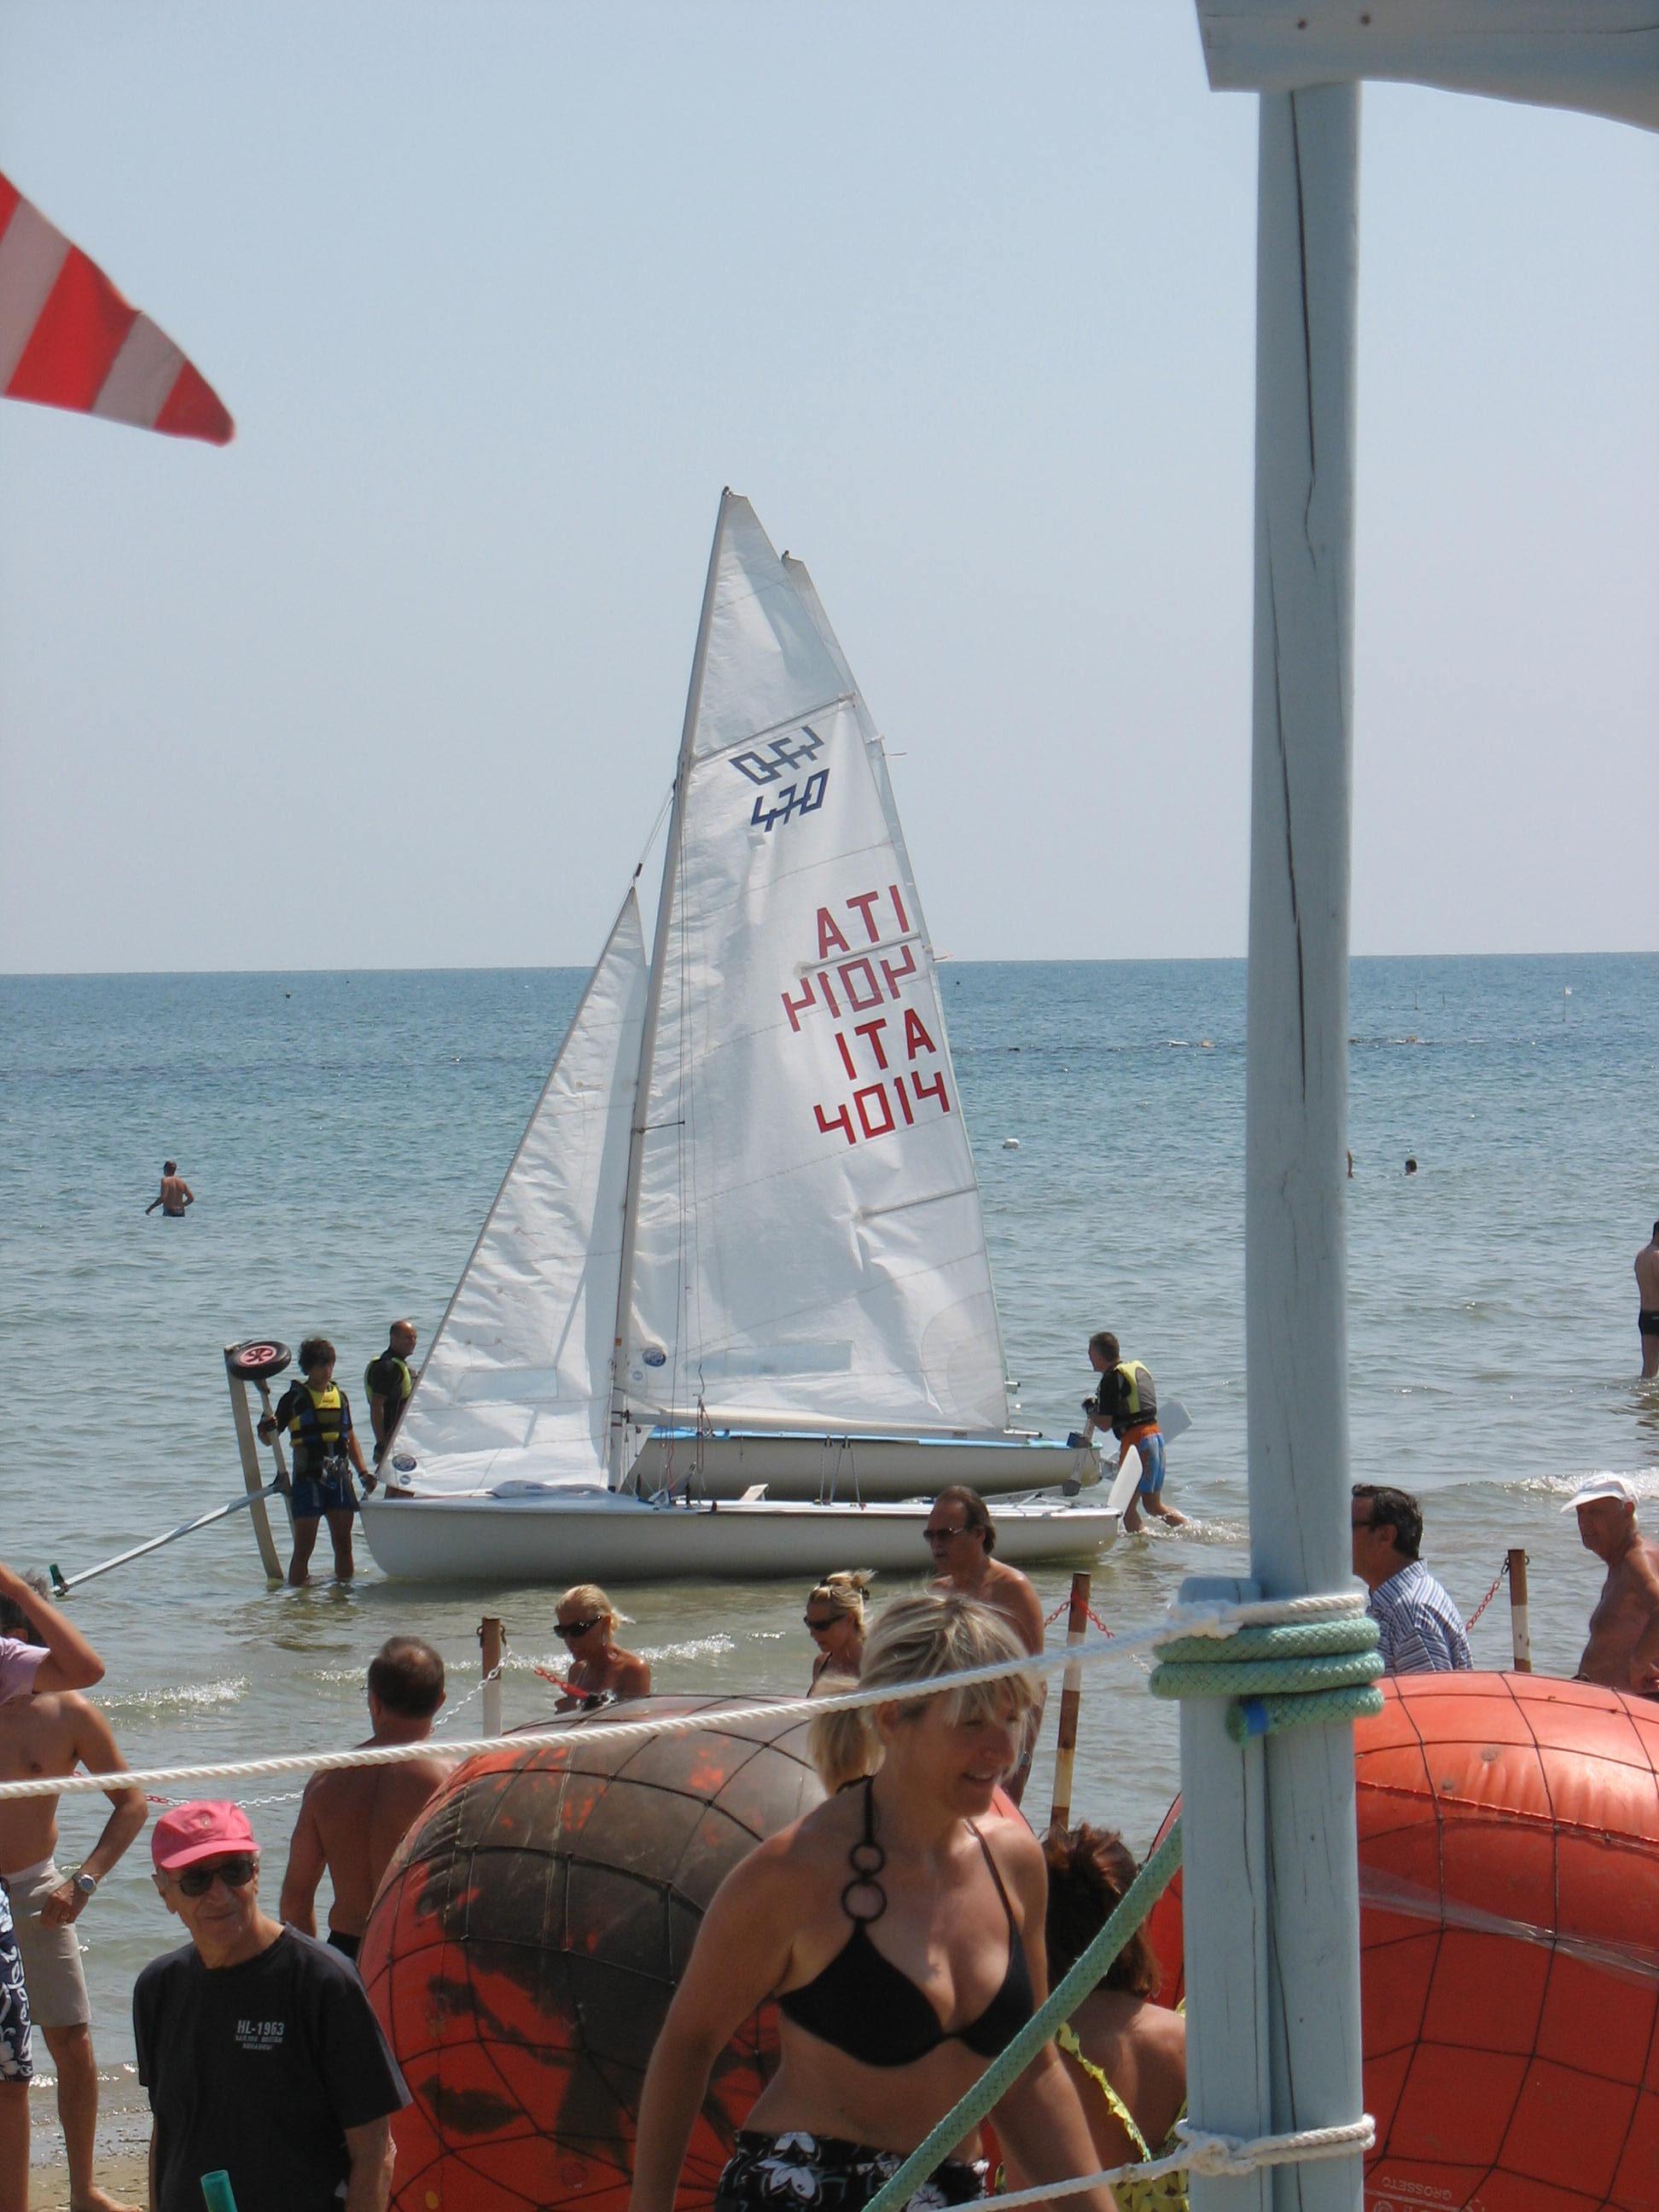 5-torneo-elia-tonelli-27062010-003